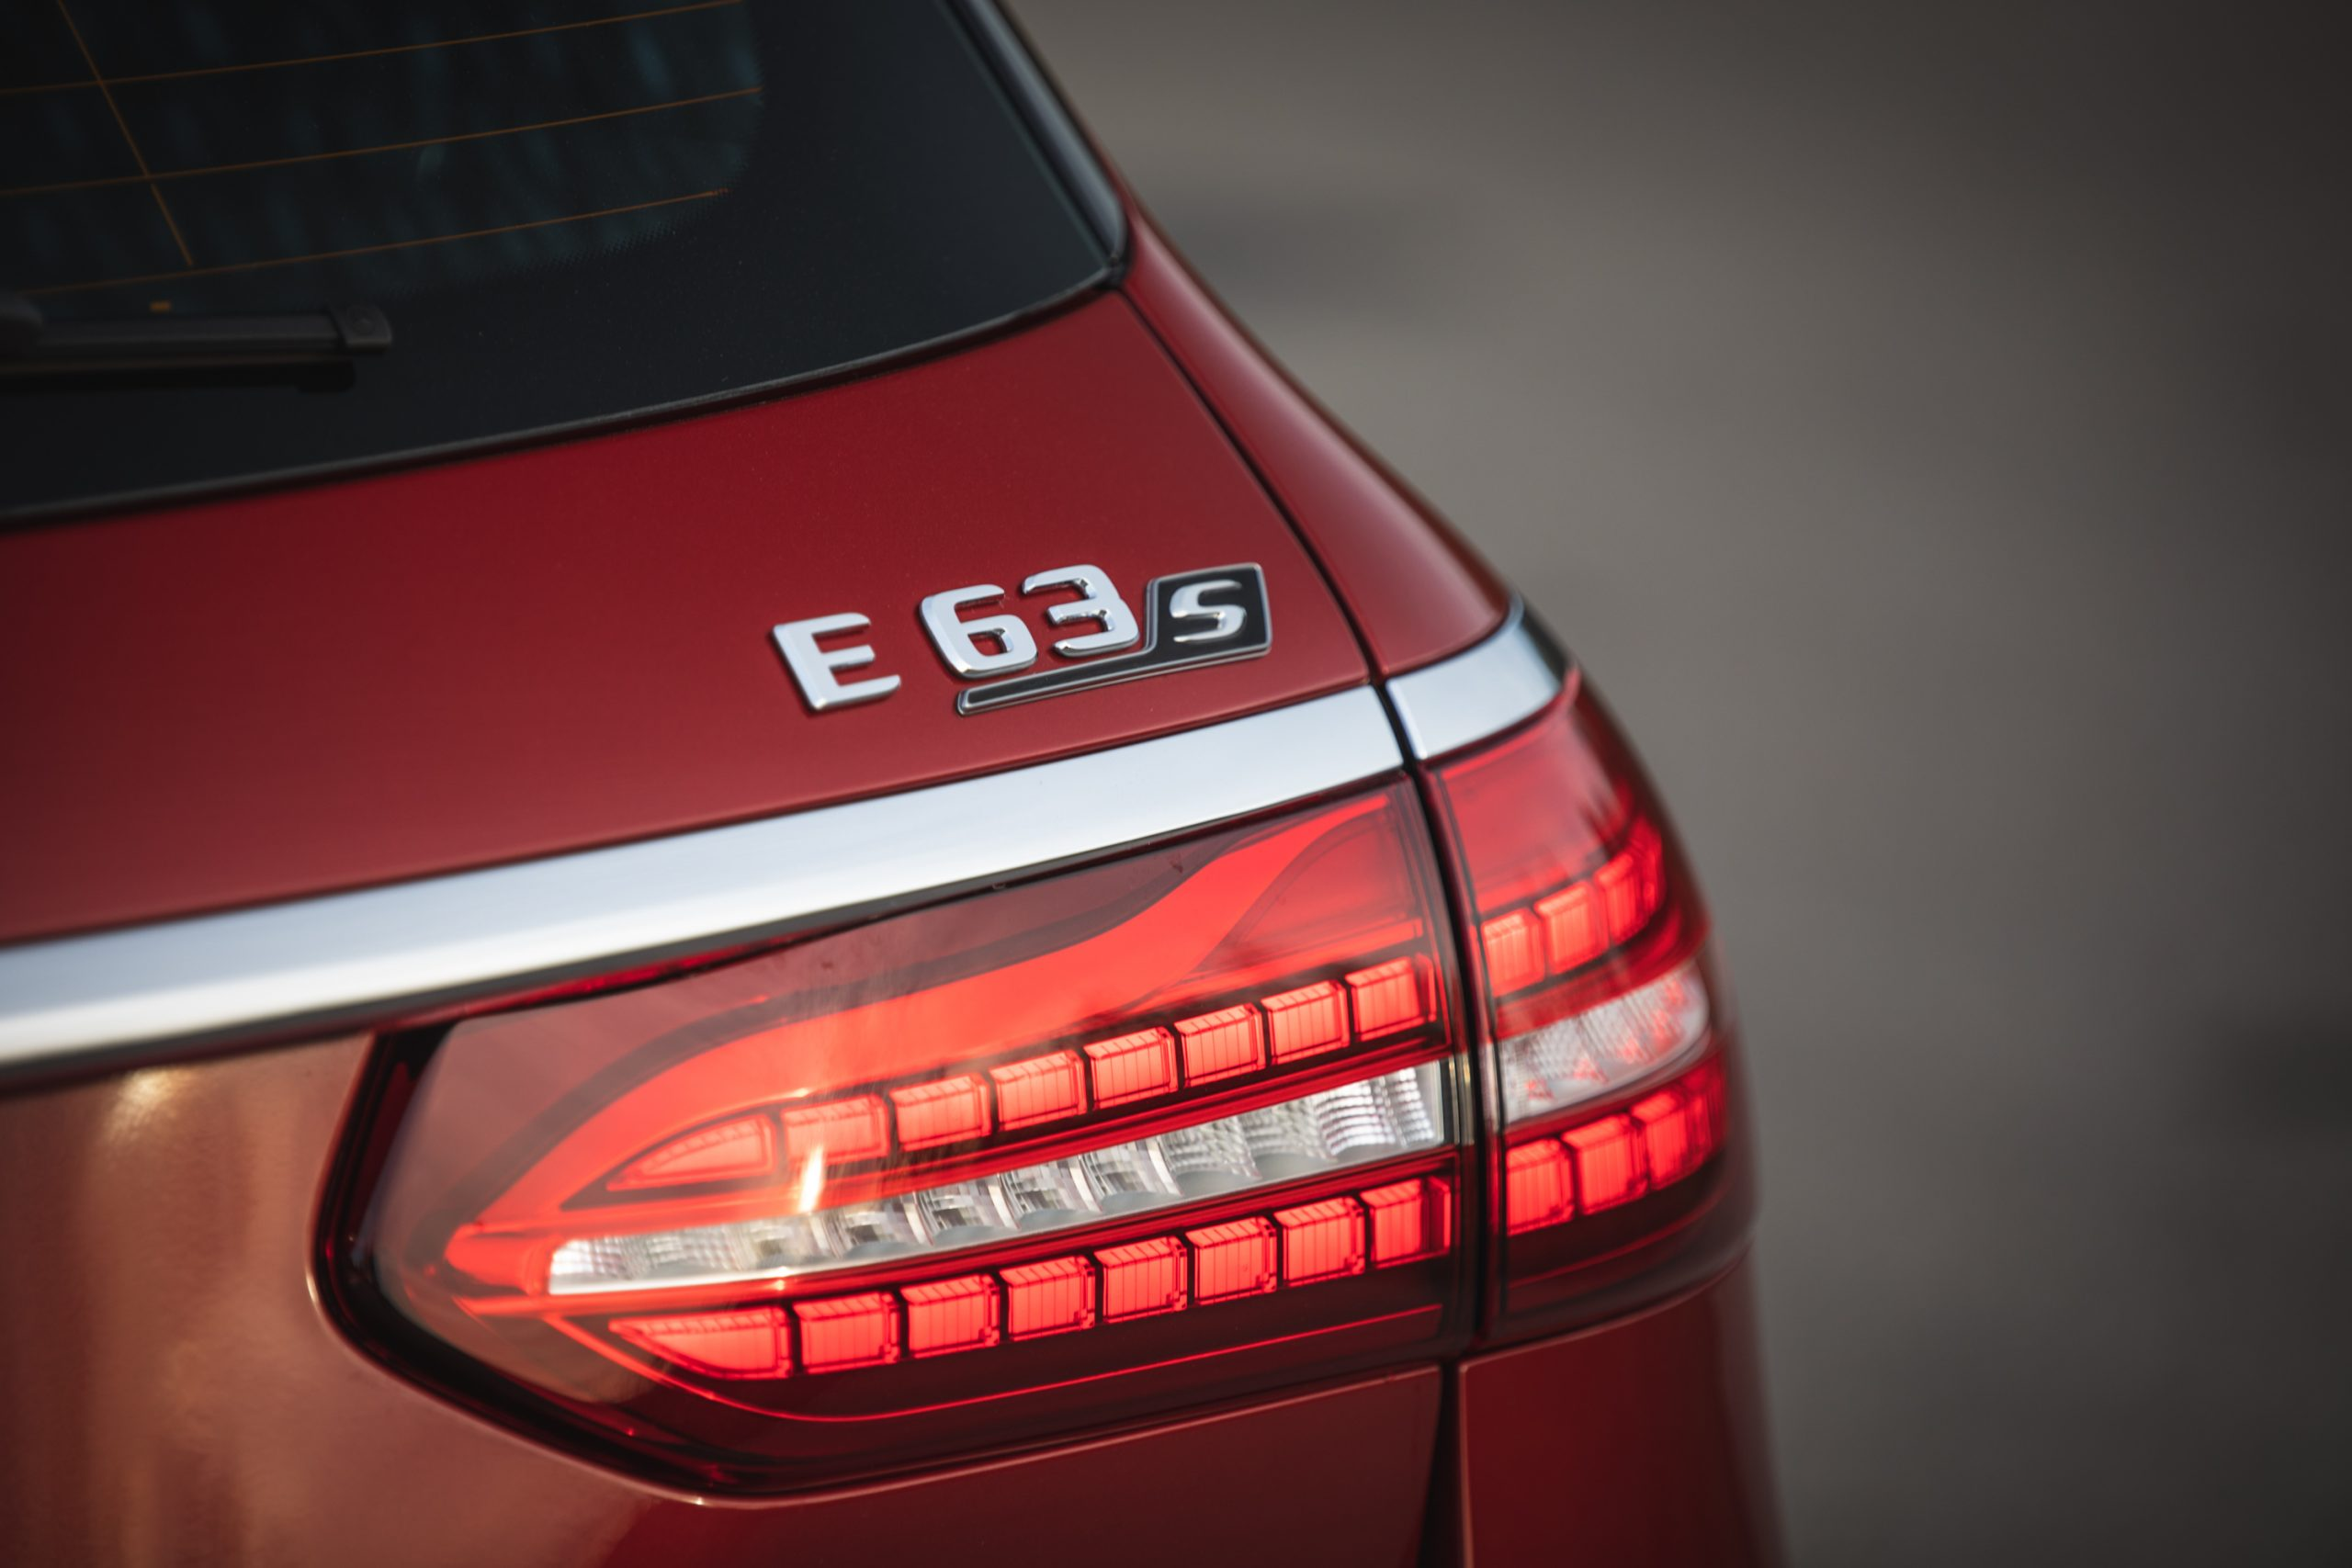 2021 Mercedes-AMG E63 S rear badge